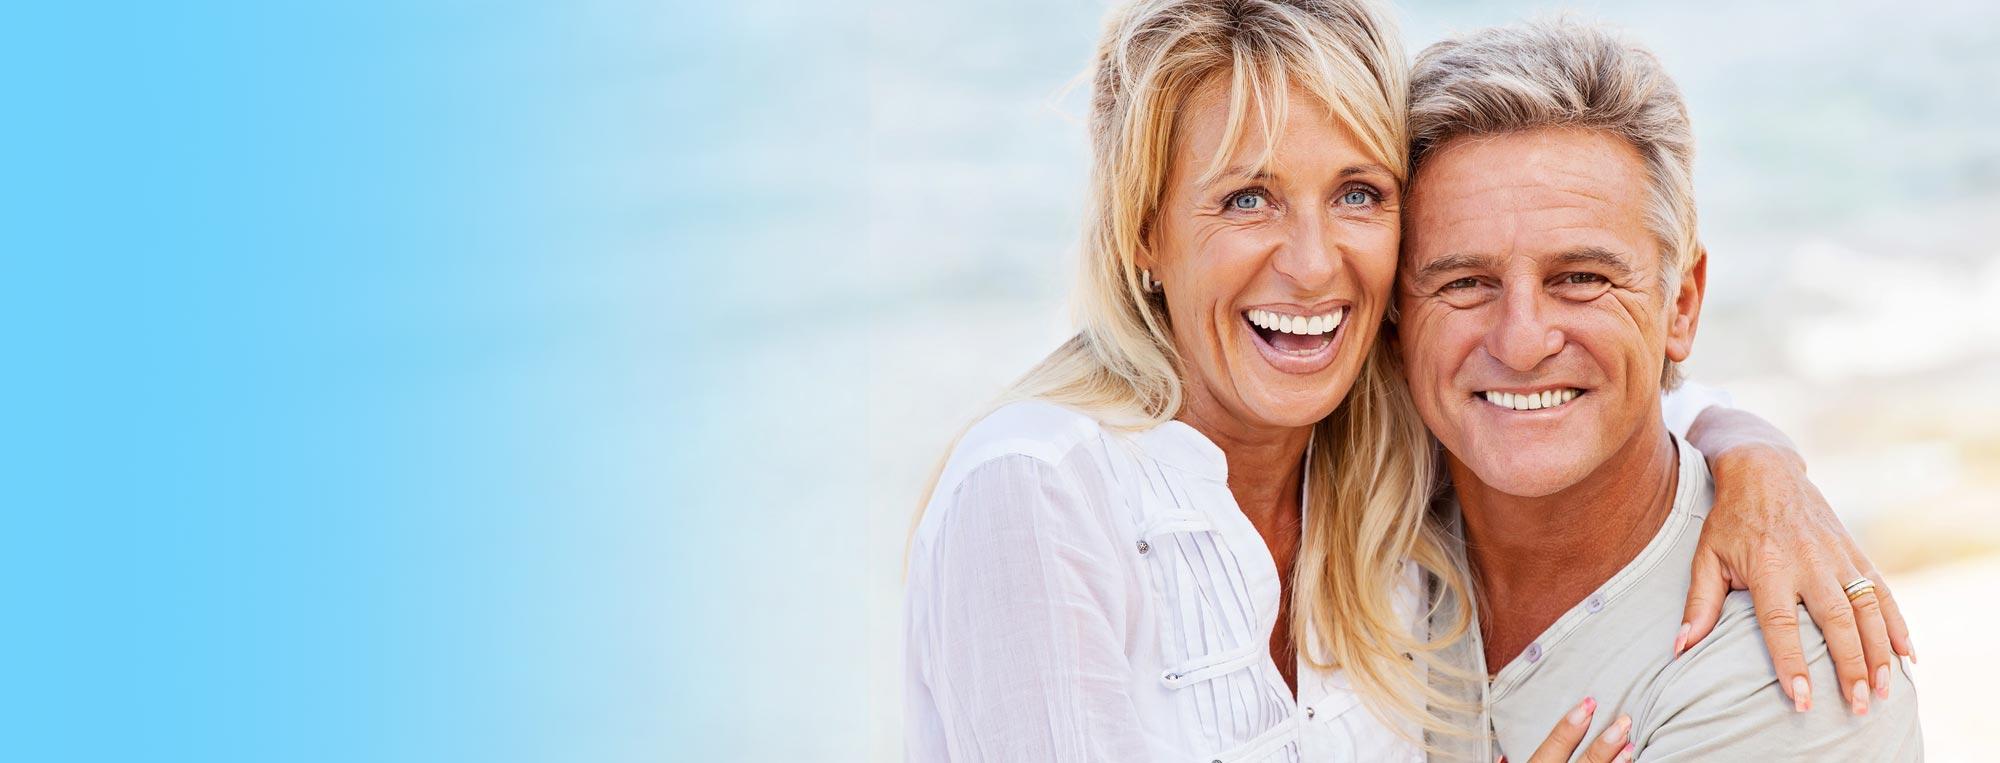 Teeth Whitening, Rolleston Dentists, Rolleston Dental Centre